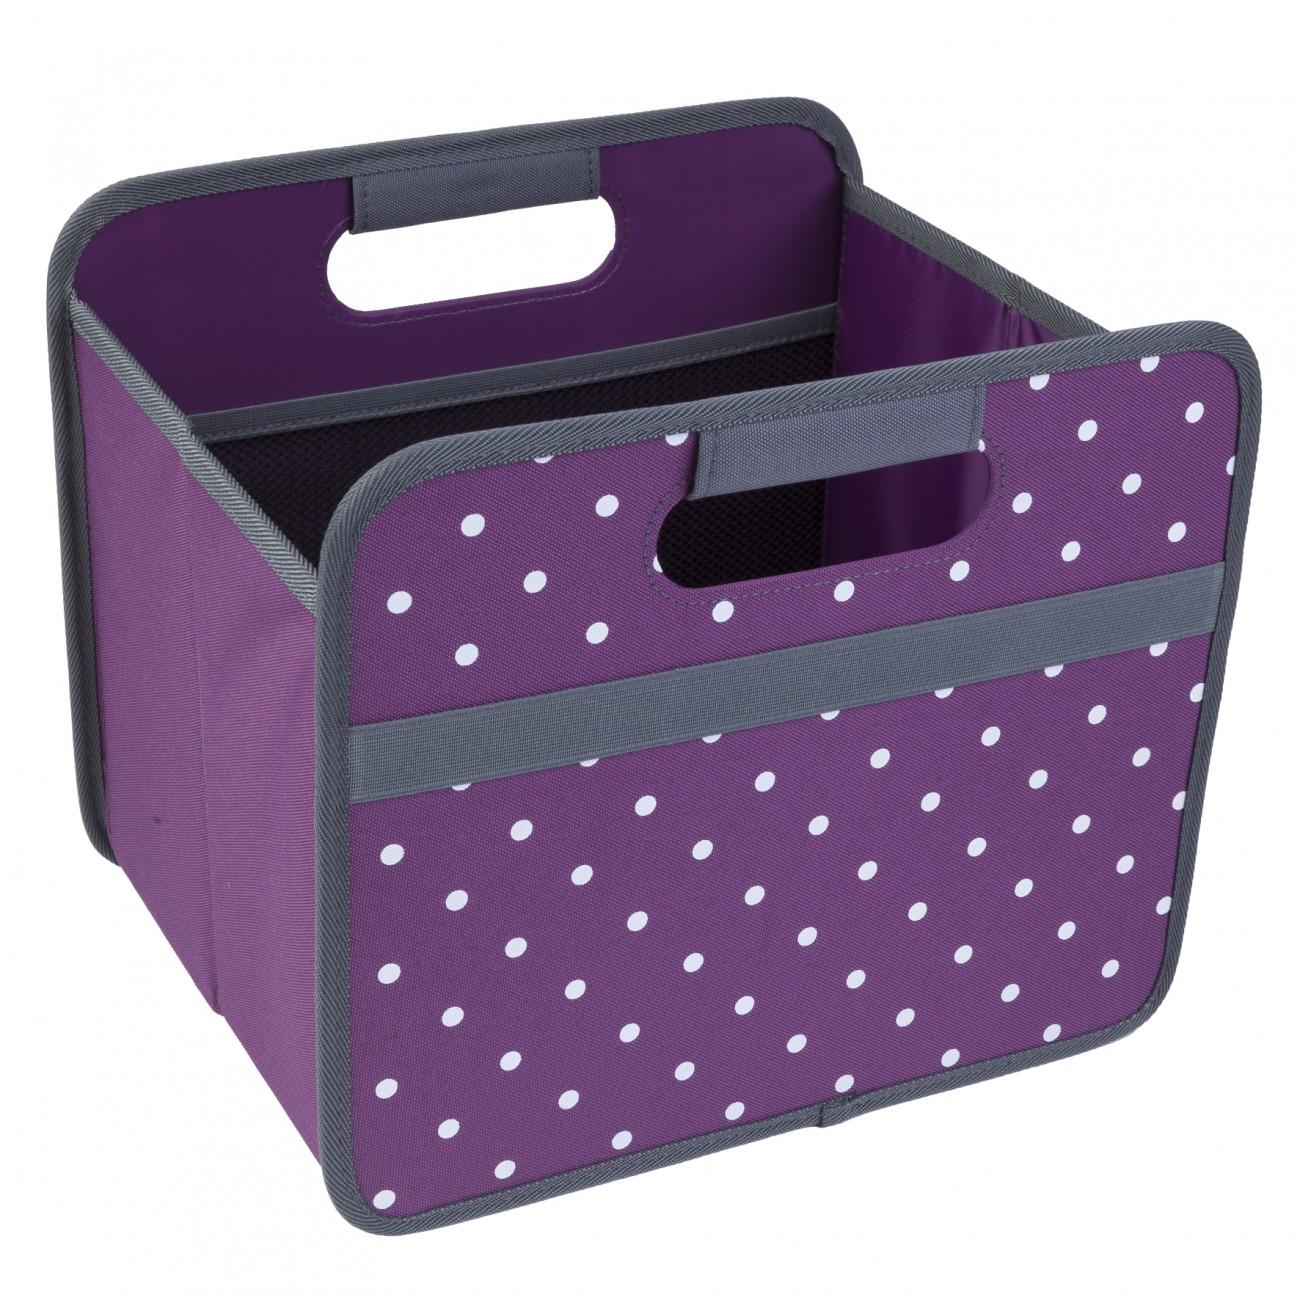 faltbox ikea aufbewahrungsbox kiste box faltbox faltkorb. Black Bedroom Furniture Sets. Home Design Ideas